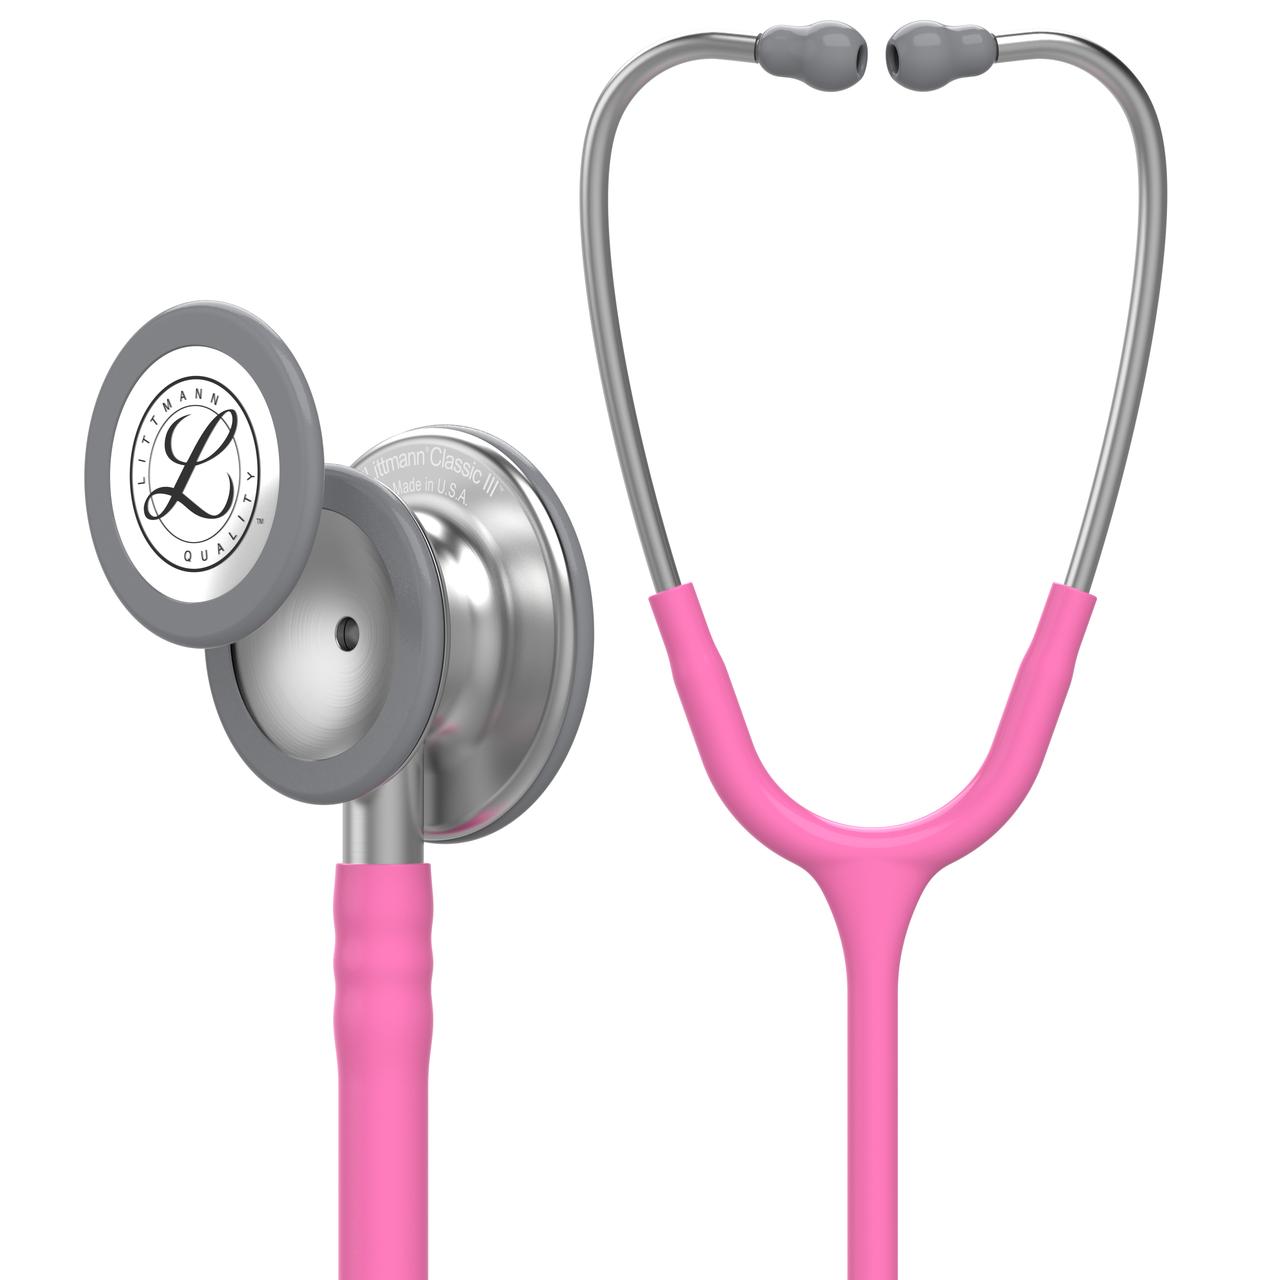 Littmann Classic III Stethoscope, Breast Cancer Edition Rose Pink, 5631